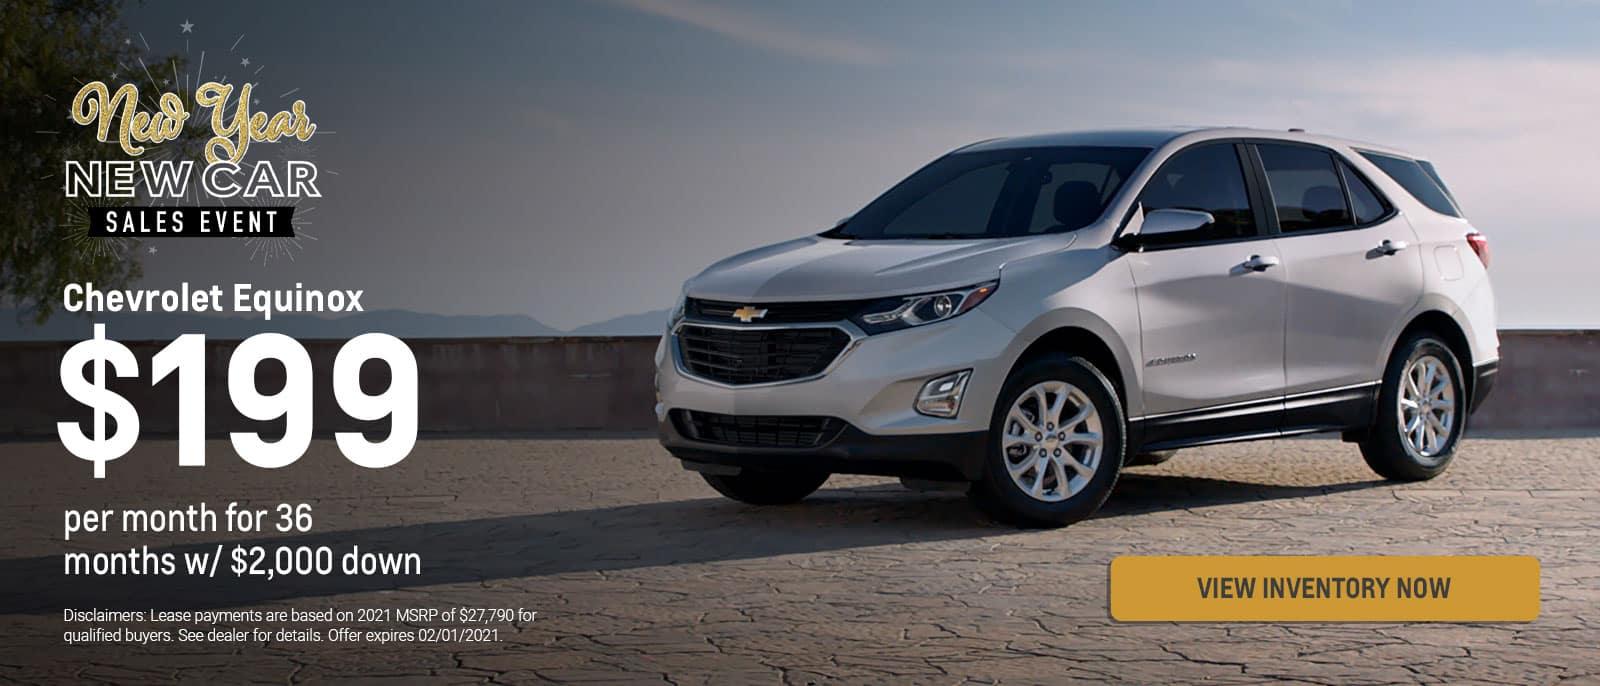 Kekurangan Dealer Chevrolet Harga